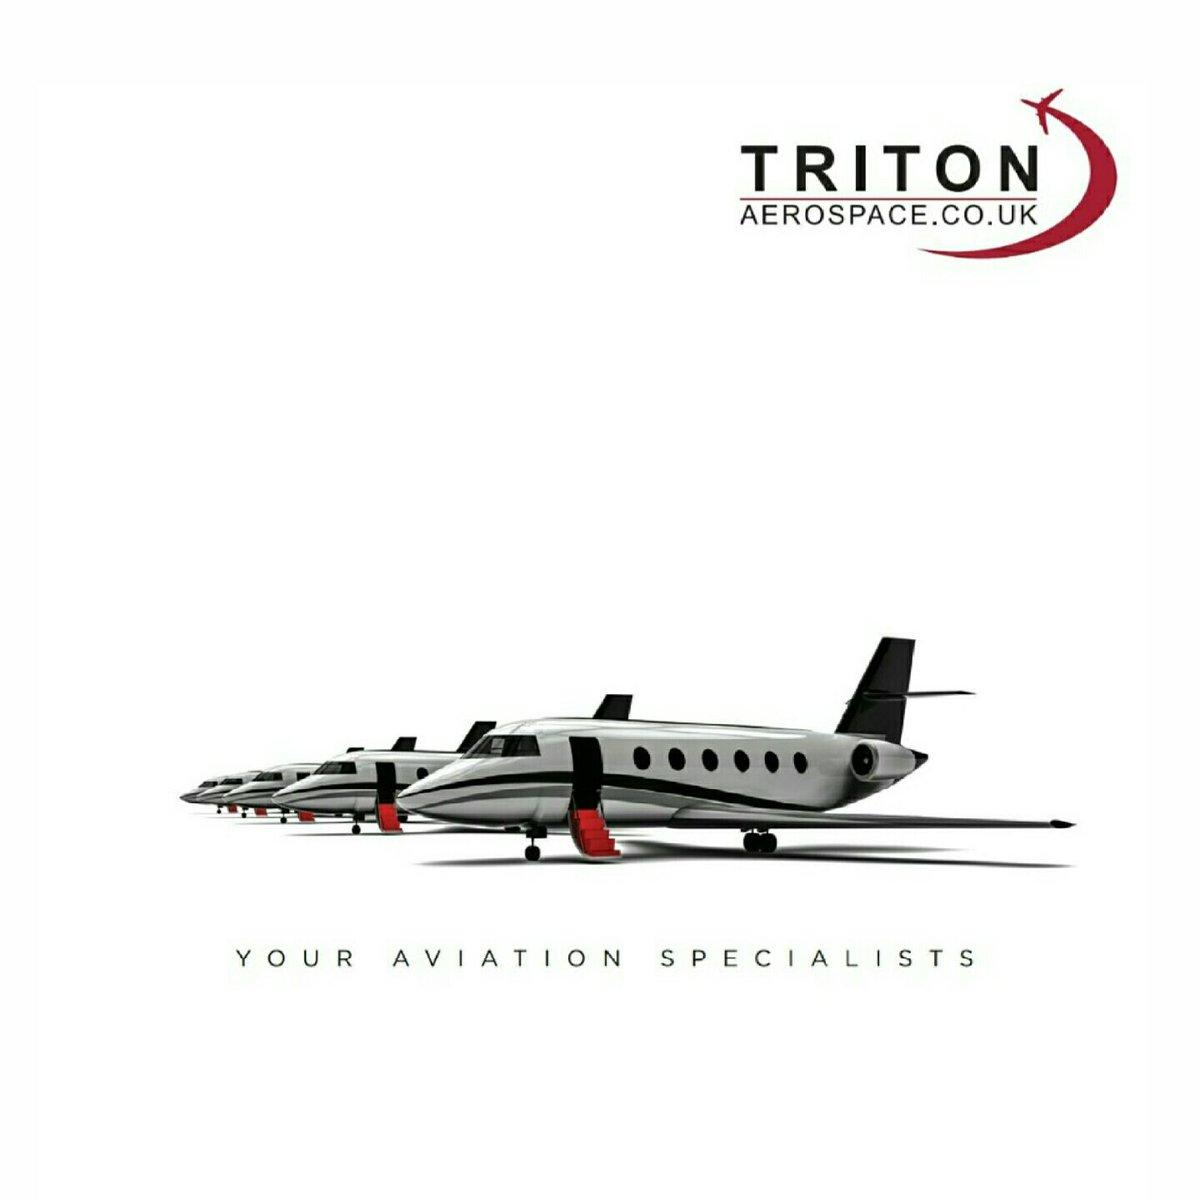 Looking to purchase or sale an #aircraft contact us  http://www. tritonaerospace.com  &nbsp;   #luxury #Travel #Flight #VIP #Jet #bizav #planes #aviation #Jets<br>http://pic.twitter.com/hUmVFAzvDu